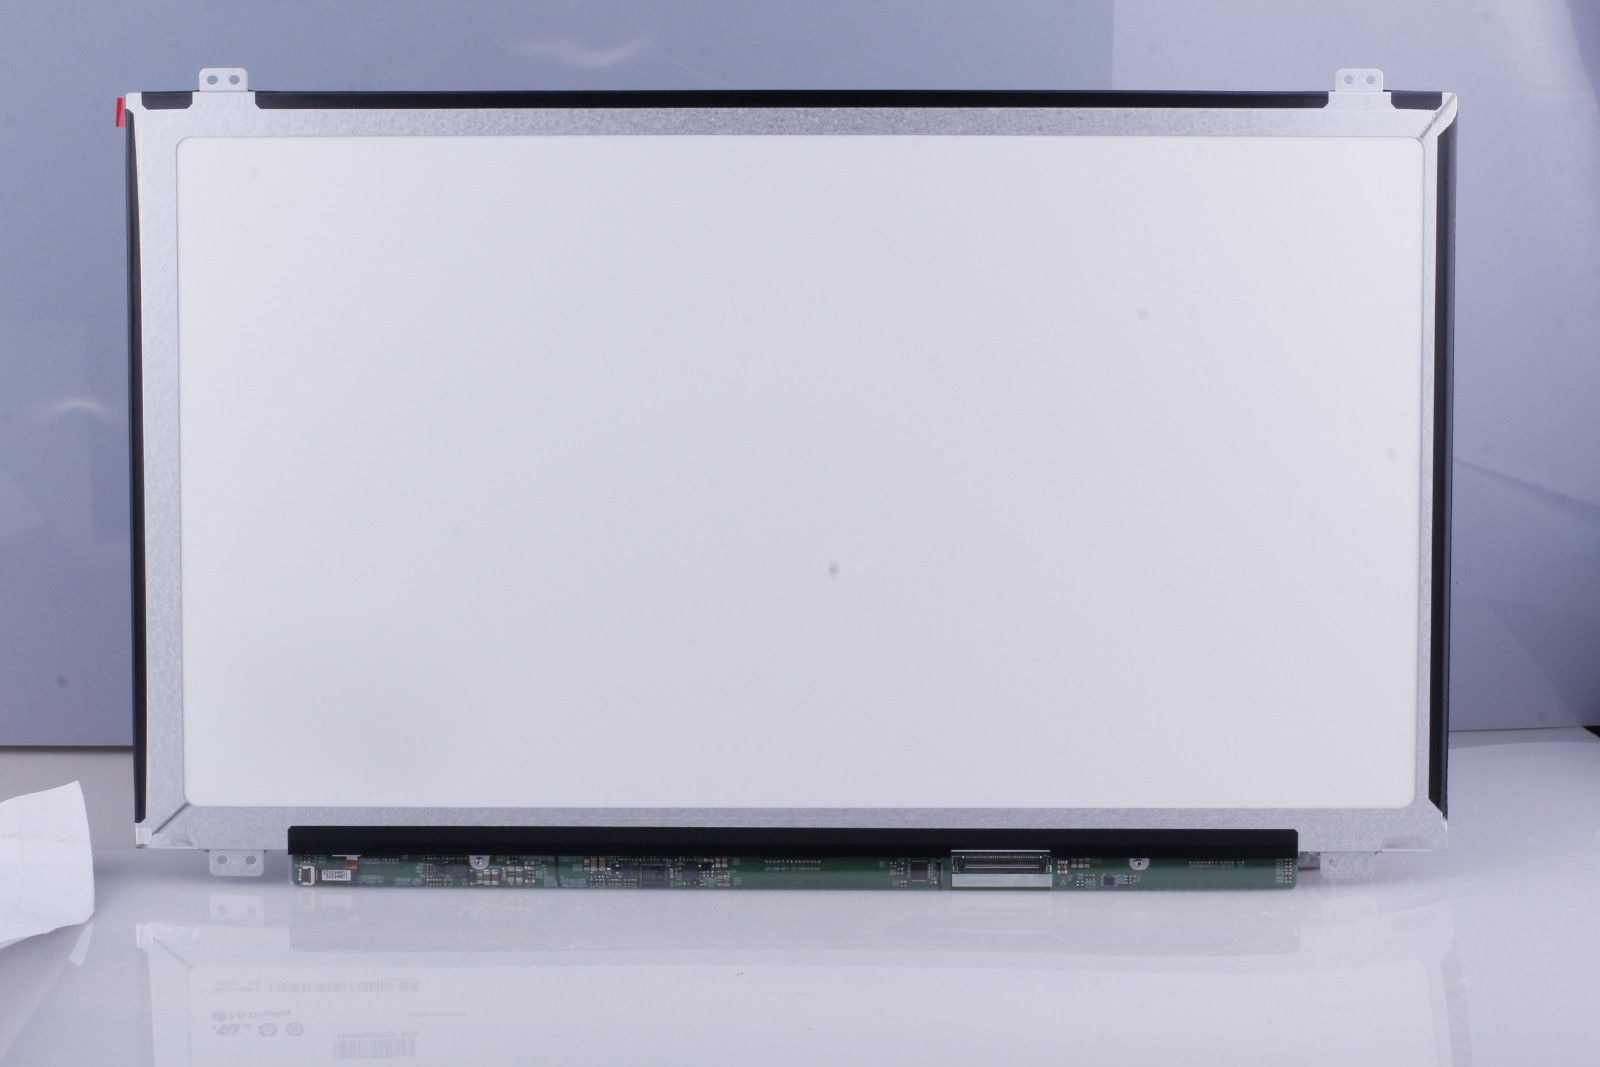 TTLCD Laptop LCD pantalla 15,6 pulgadas 1366x768 LED para Asus R510CA-RB31 reemplazo